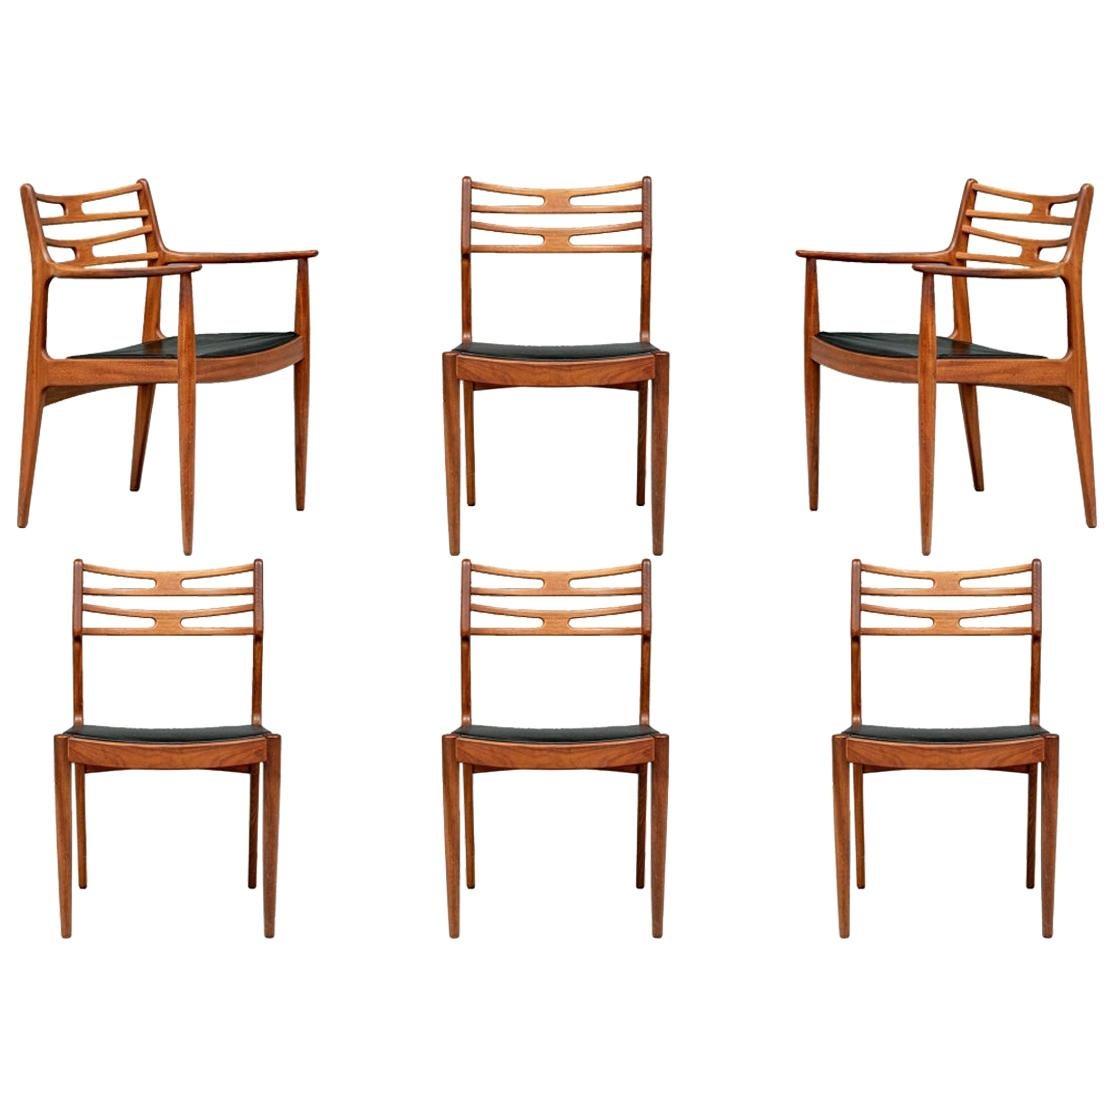 Set of 6 Danish Midcentury Teak Dining Chairs